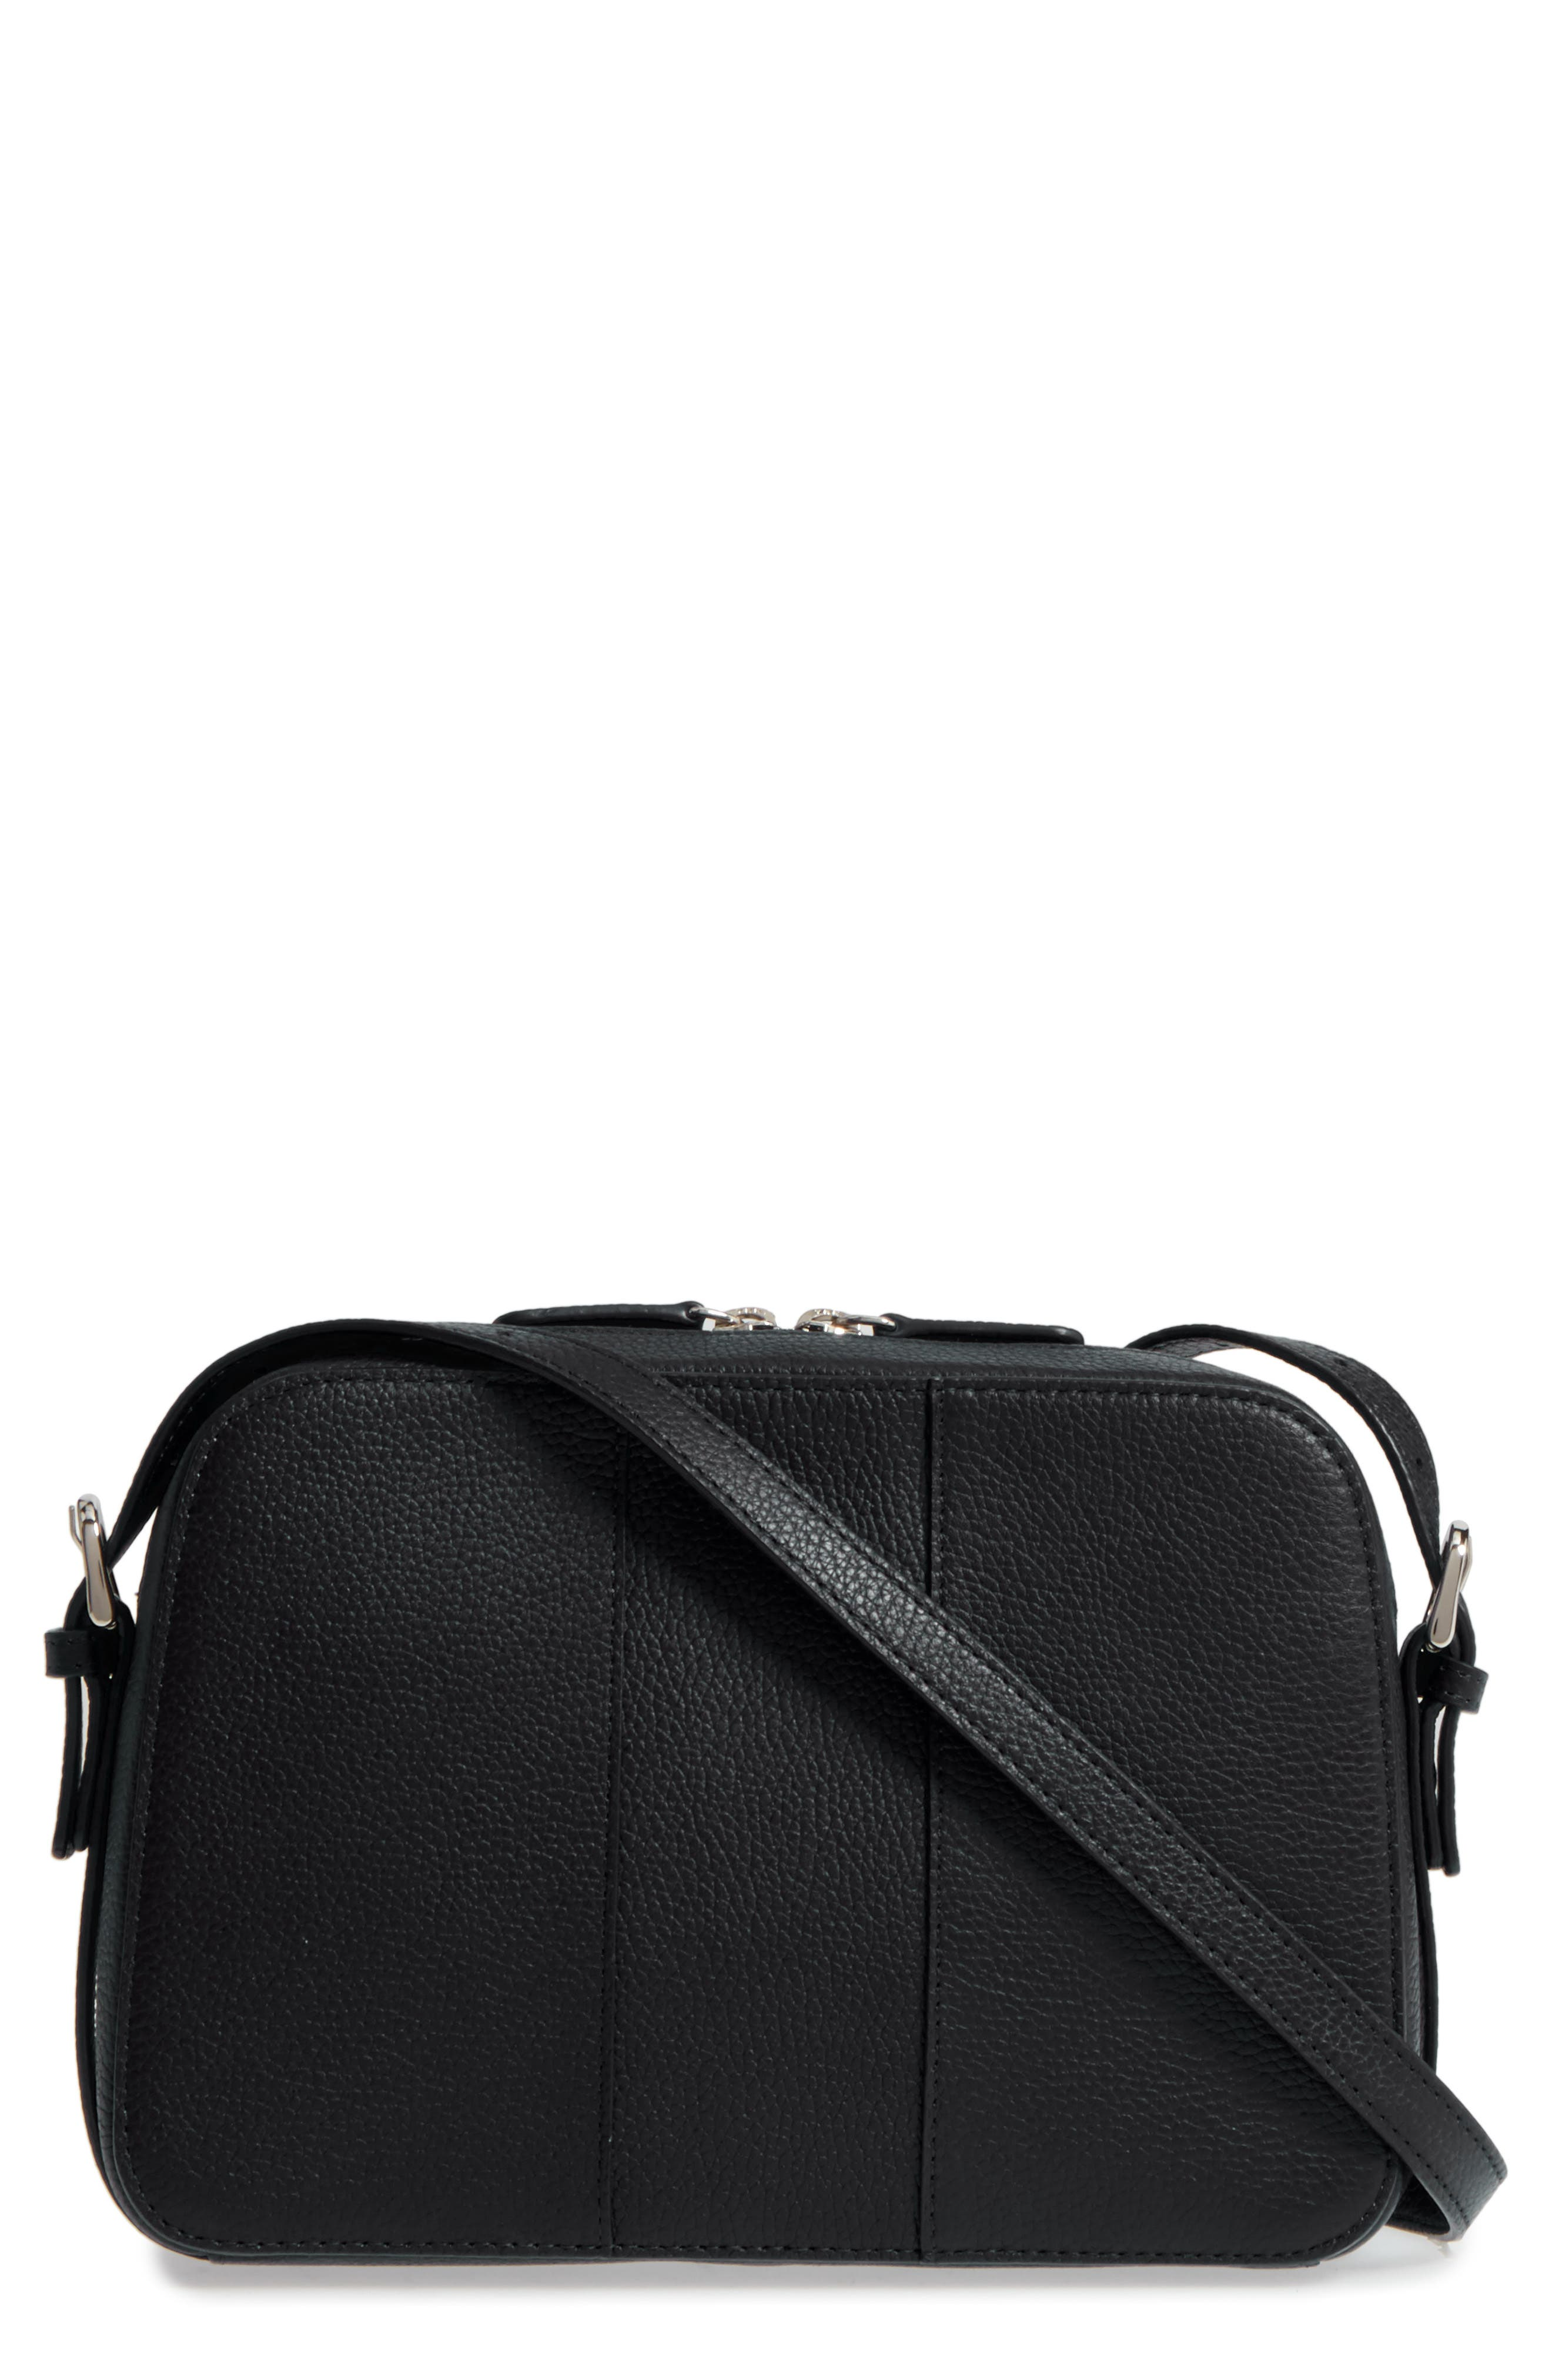 Brayden Leather Crossbody Camera Bag,                         Main,                         color,